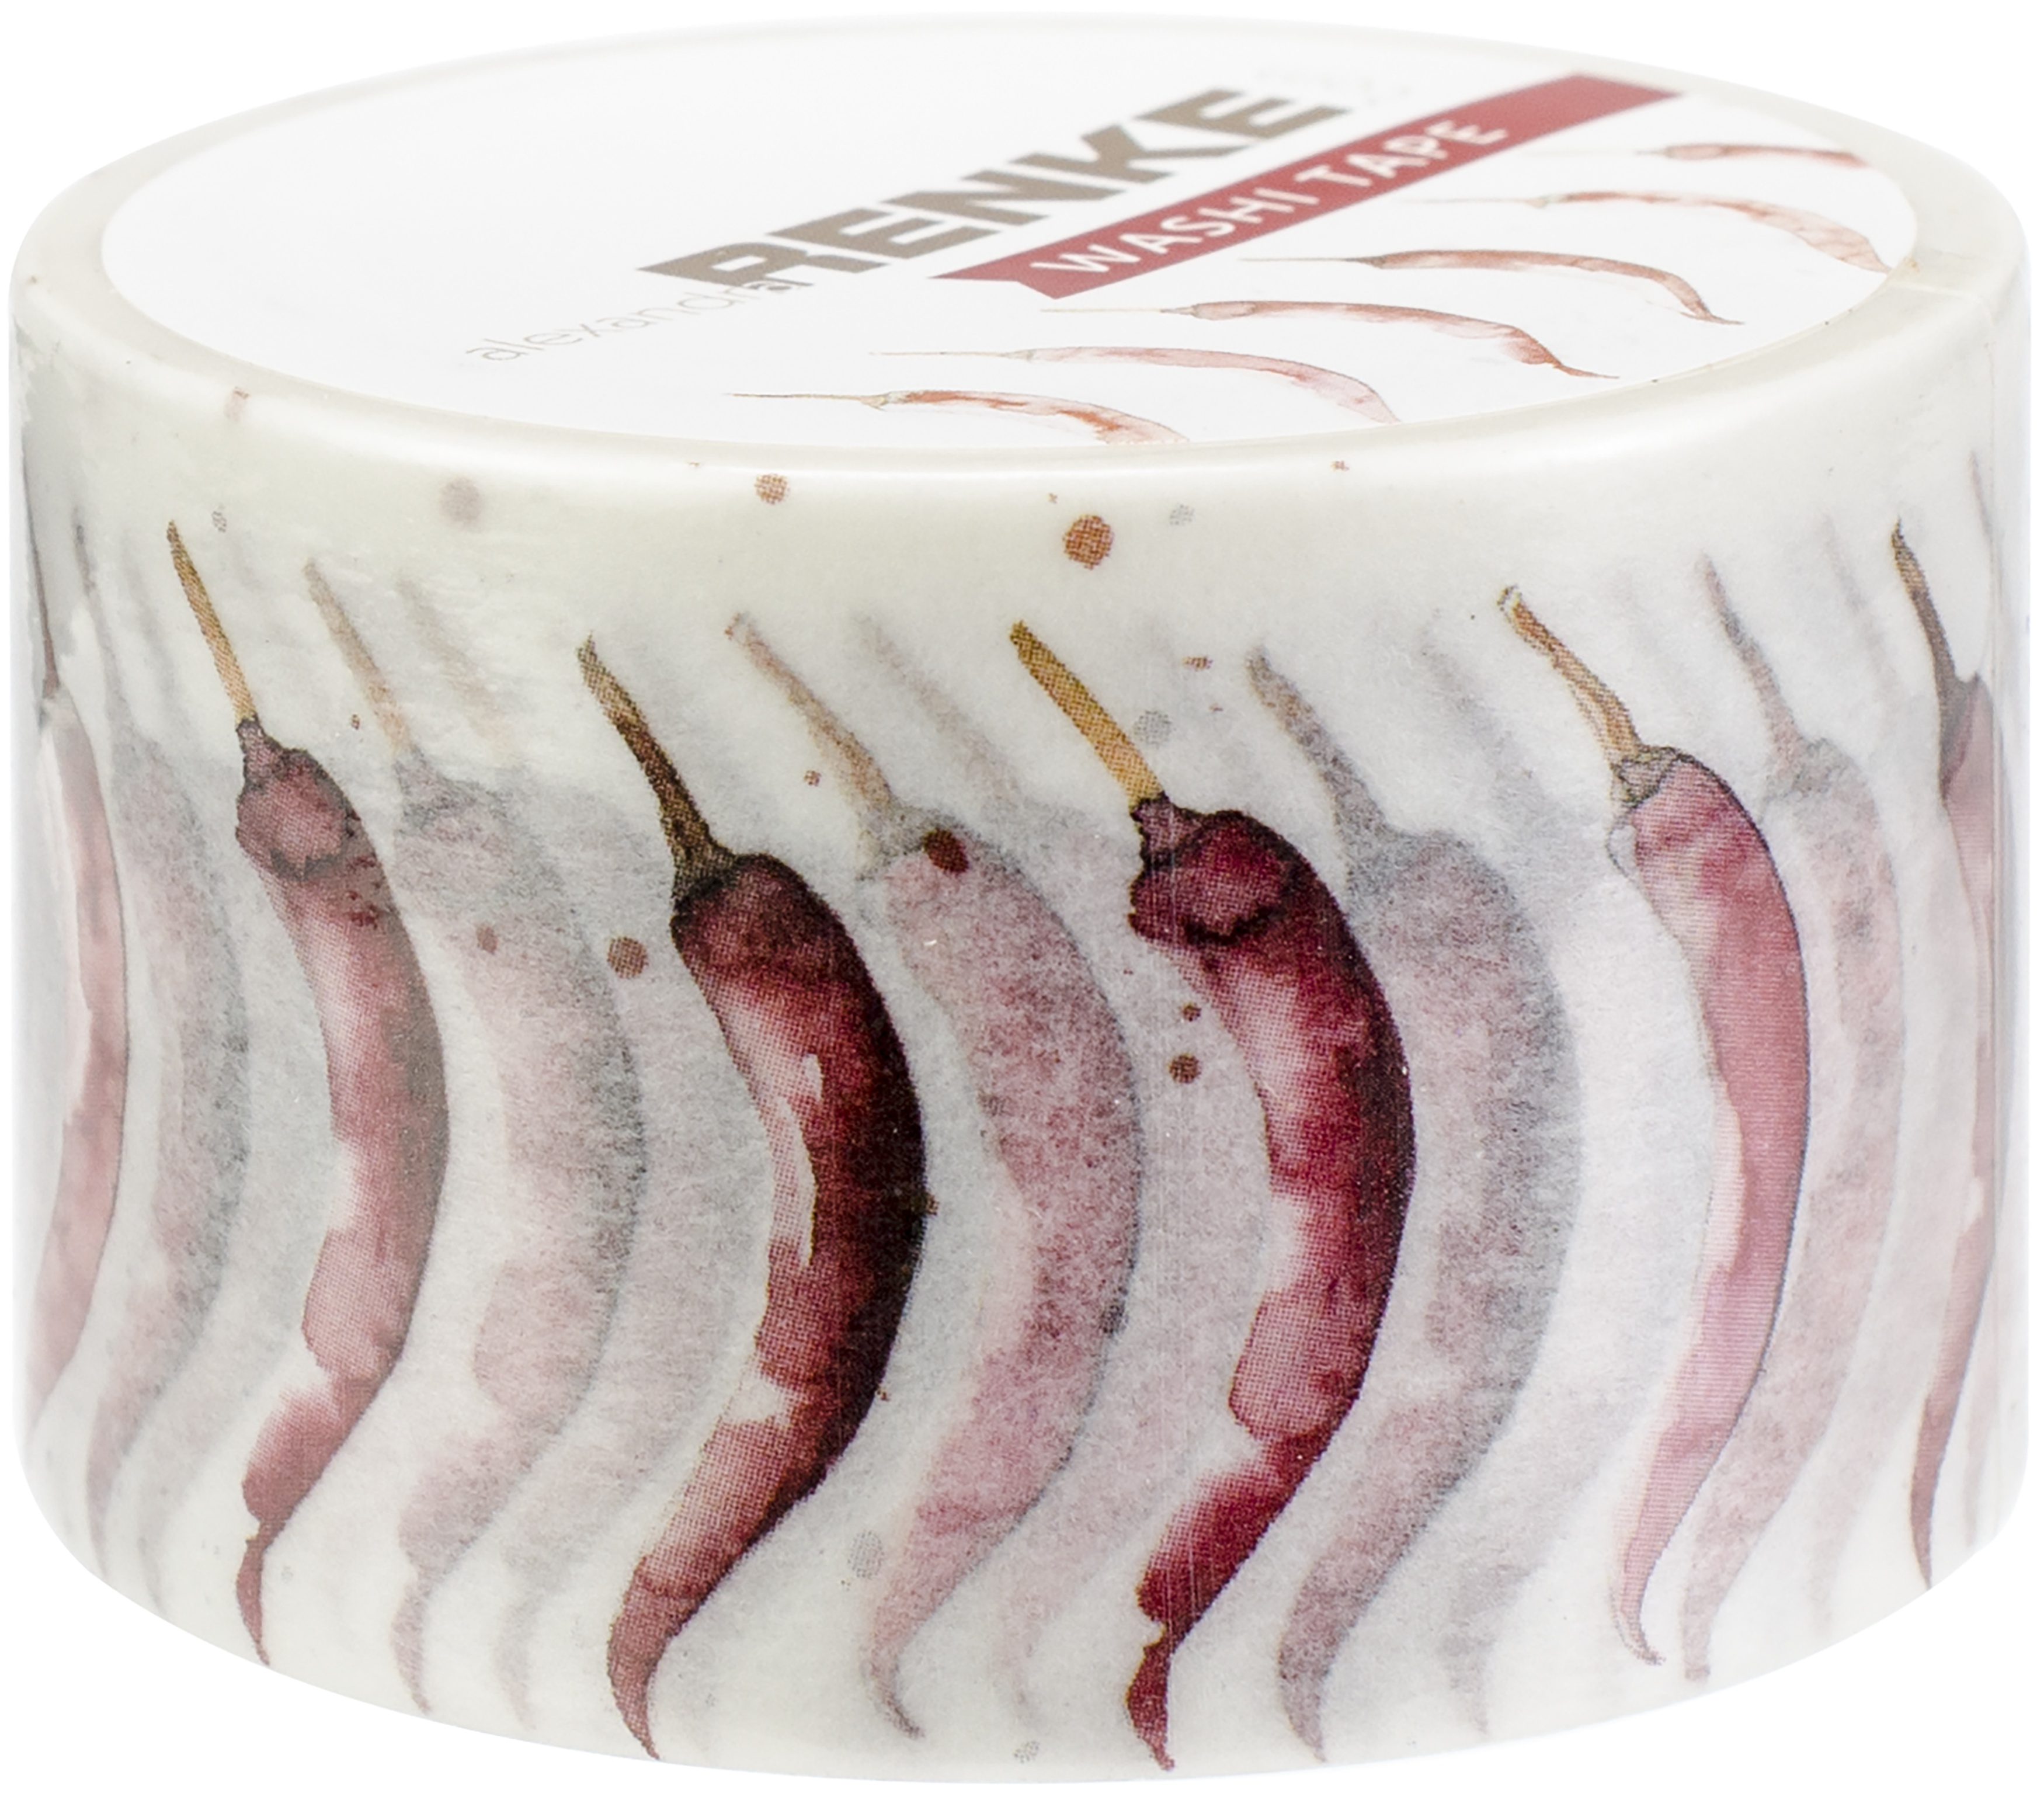 Alexandra Renke Cooking Collection - Chili Washi Tape - Ruban décoratif adhésif